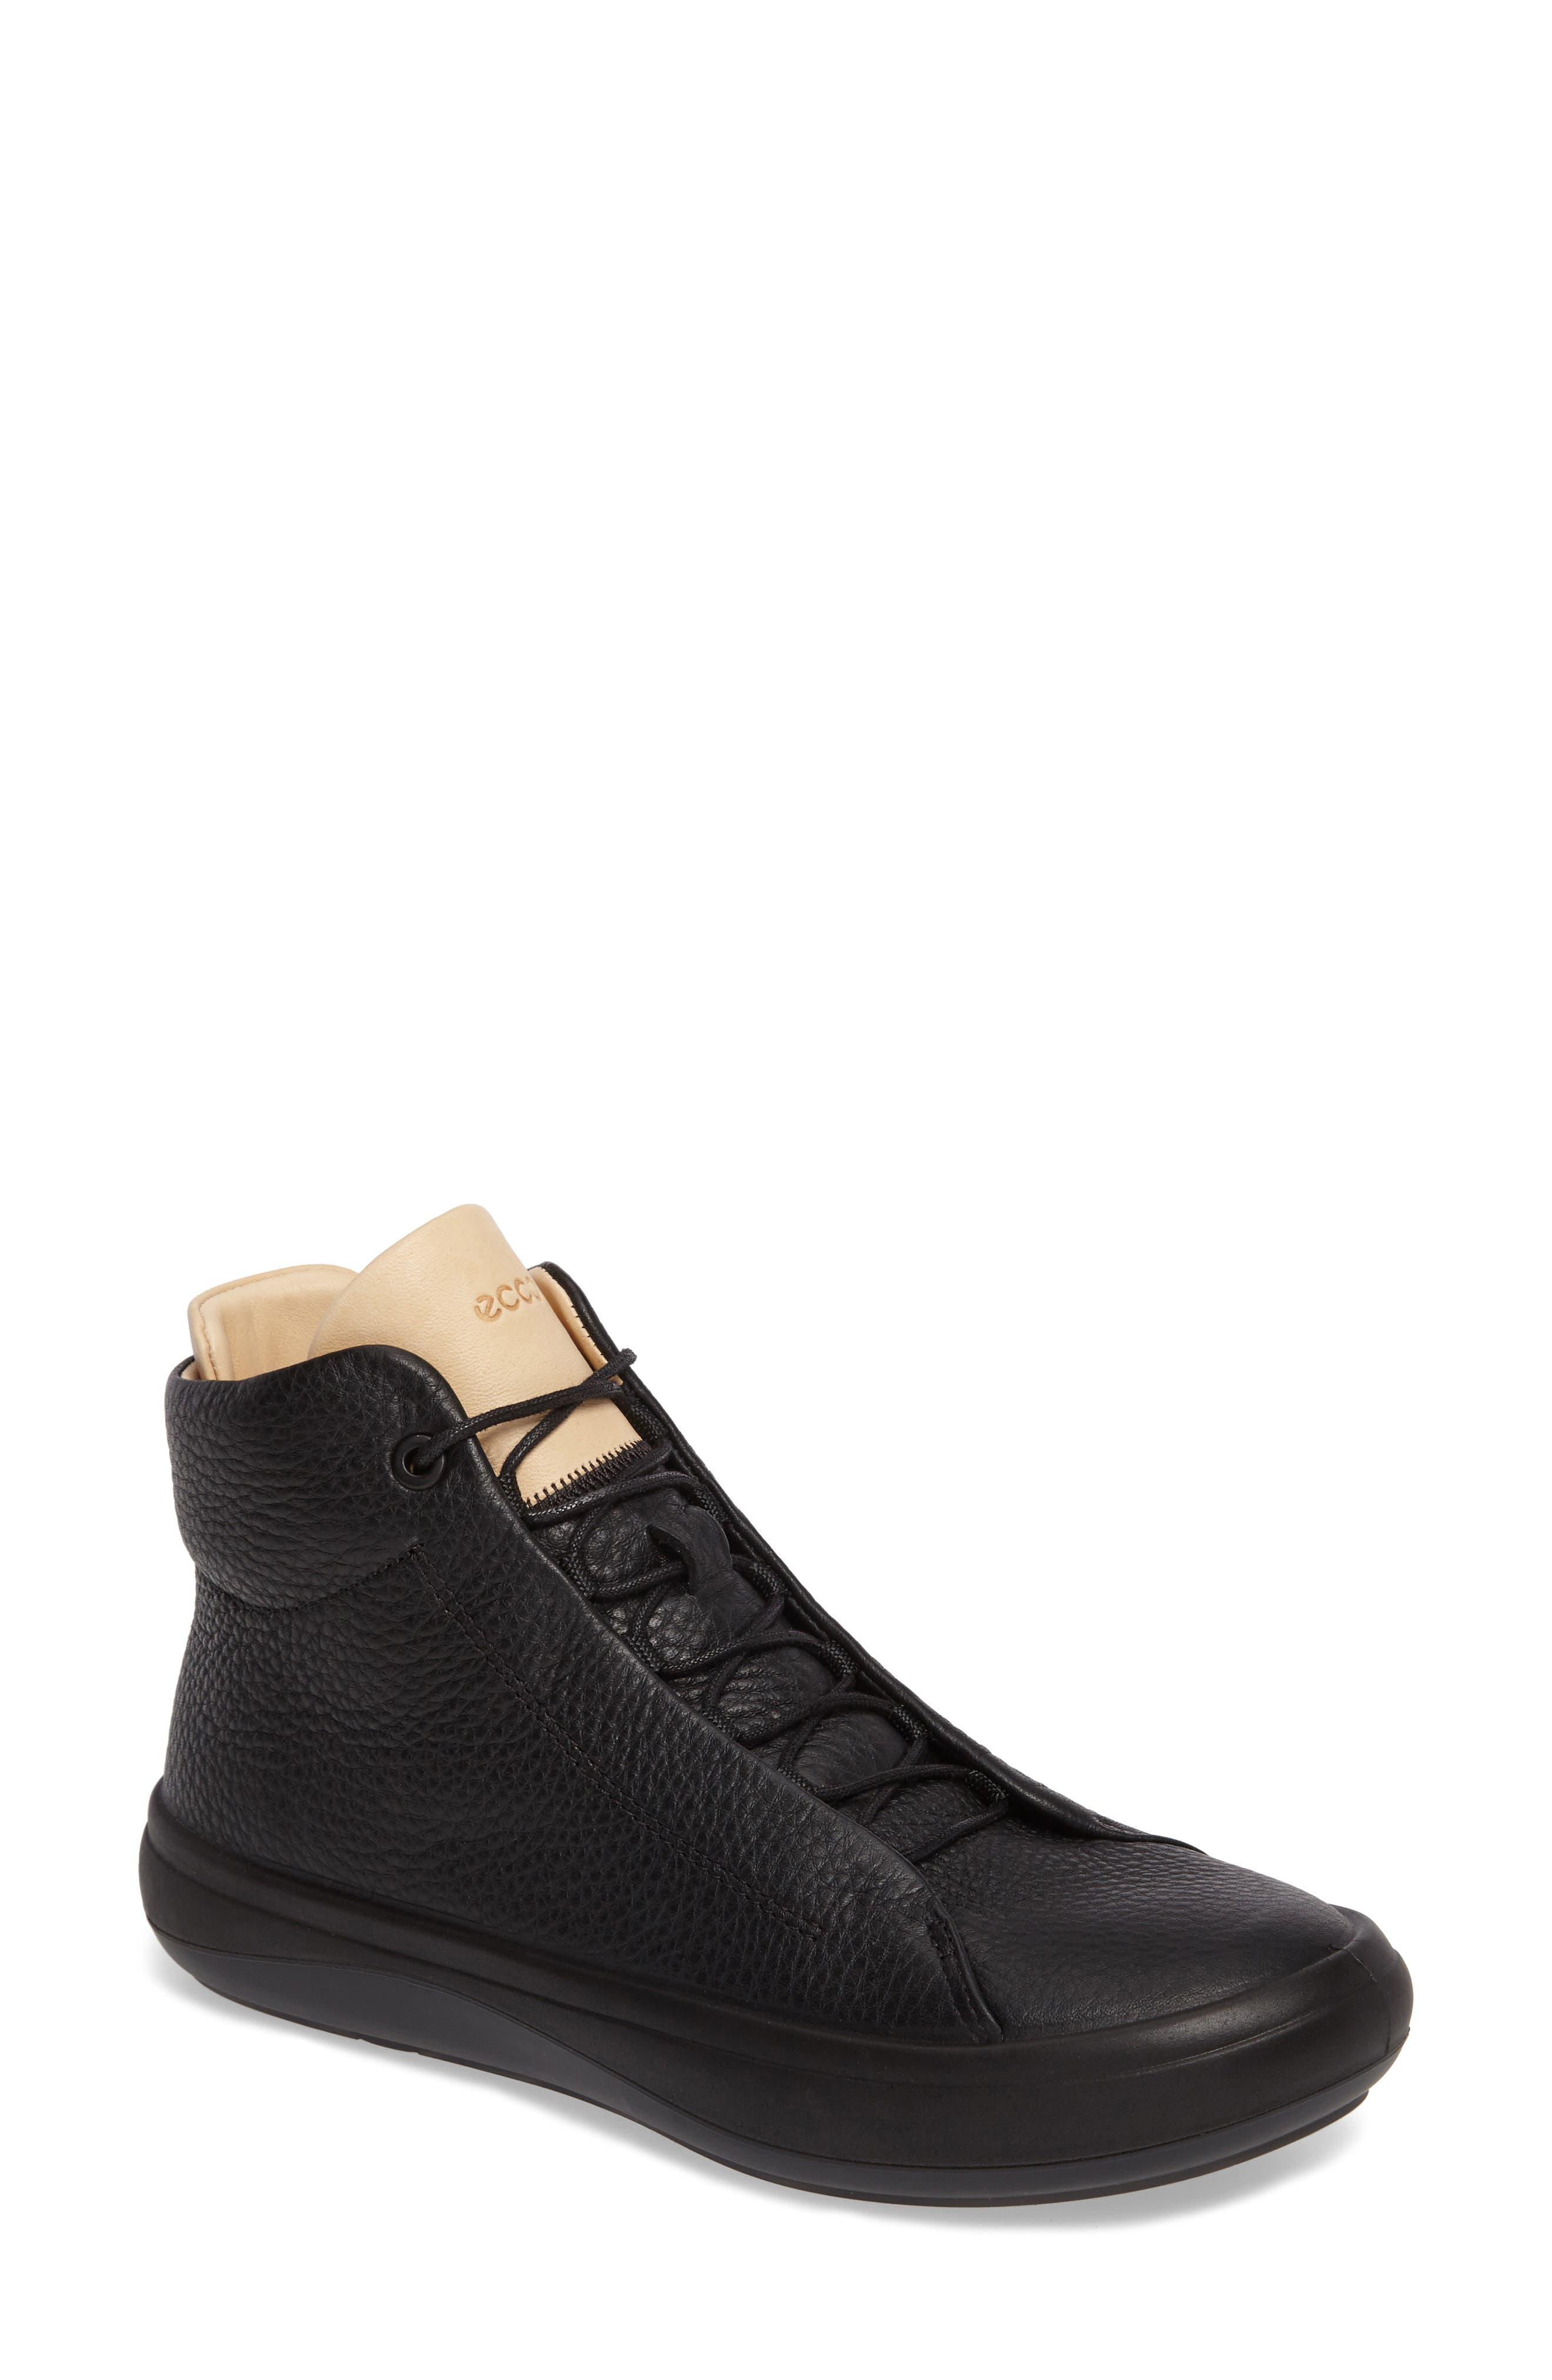 Kinhin Sneaker,                         Main,                         color, 013